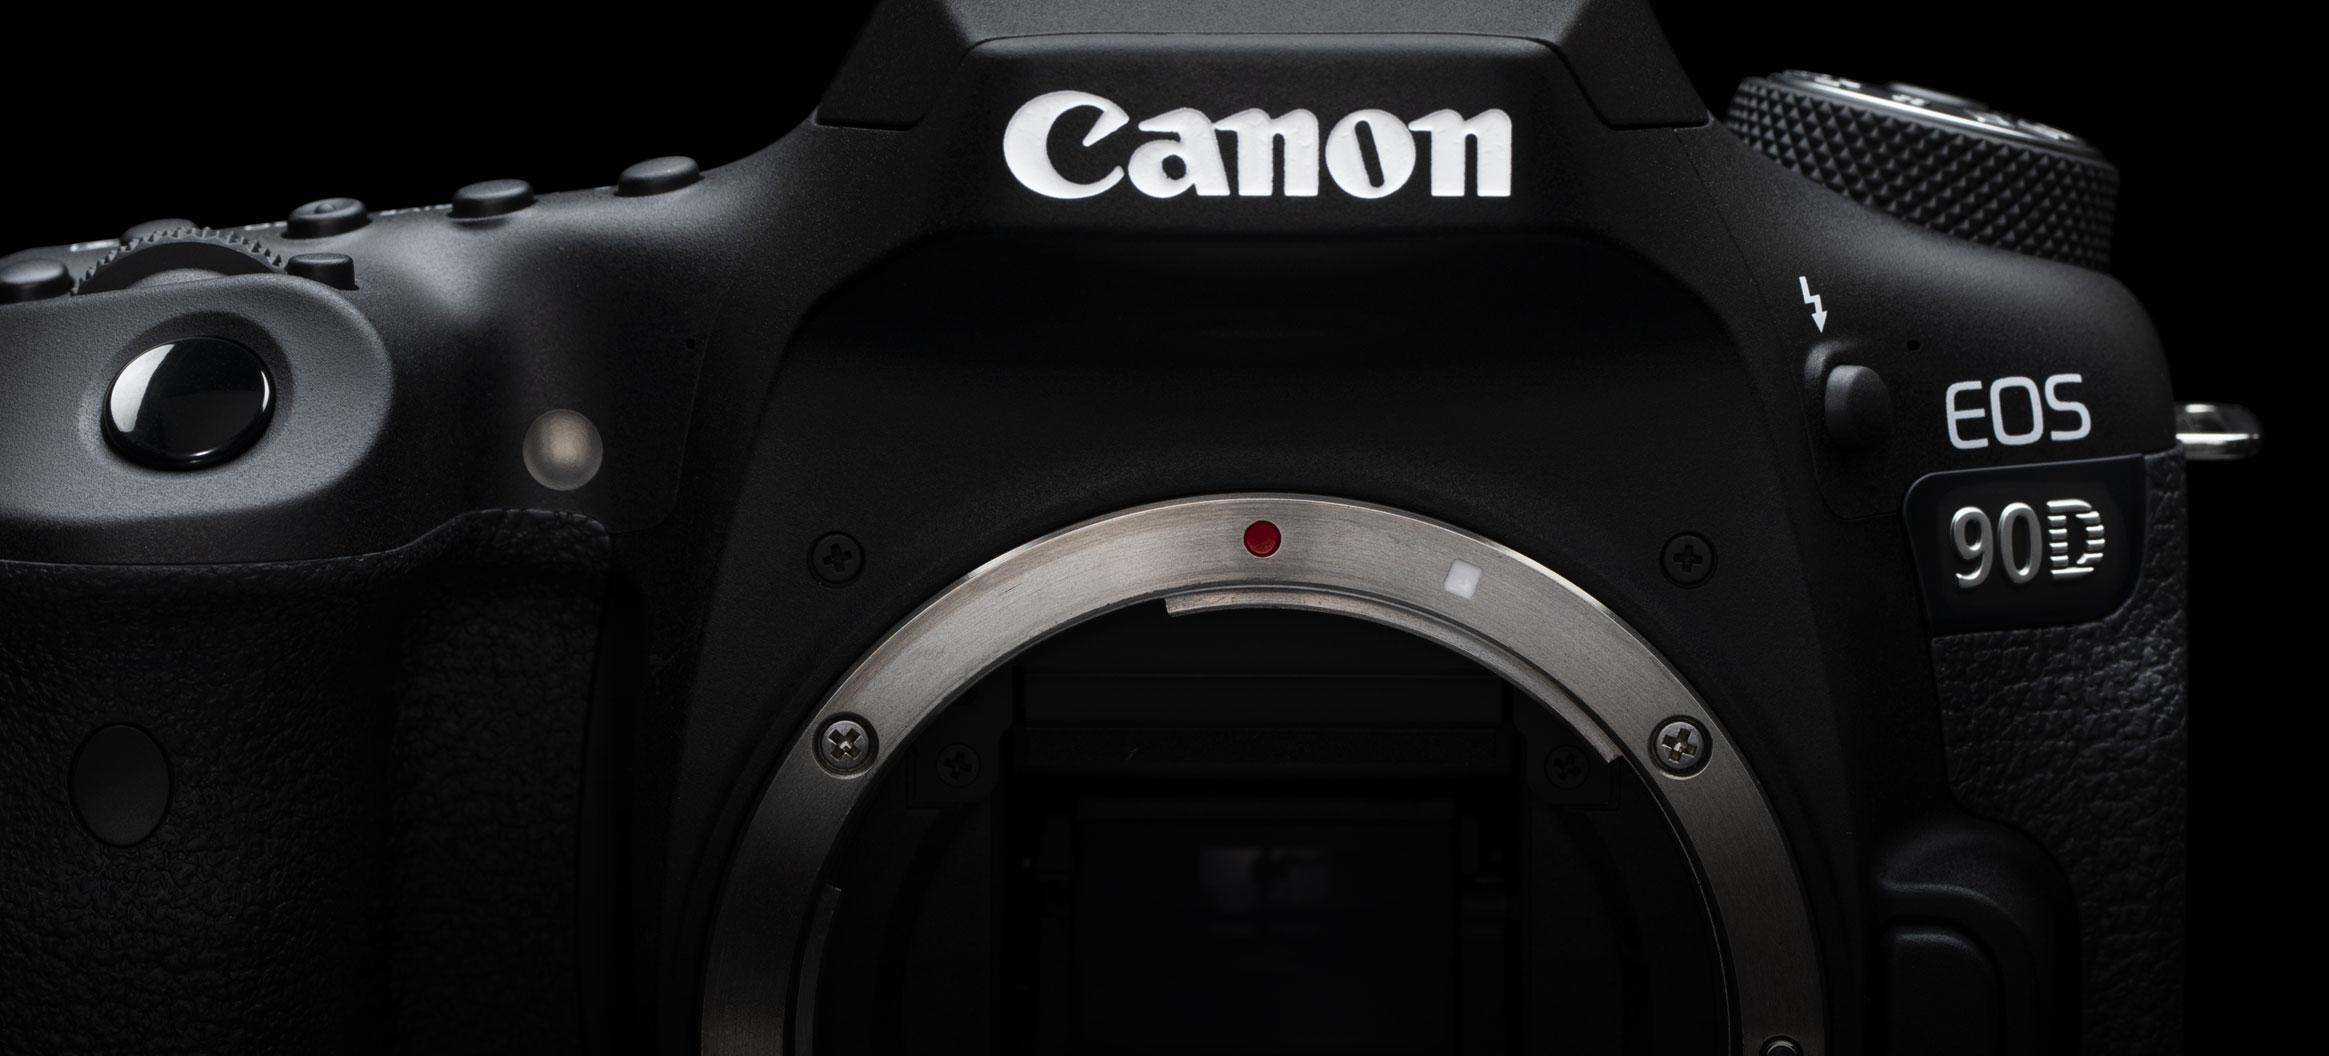 Canon-uutuus EOS 90D!